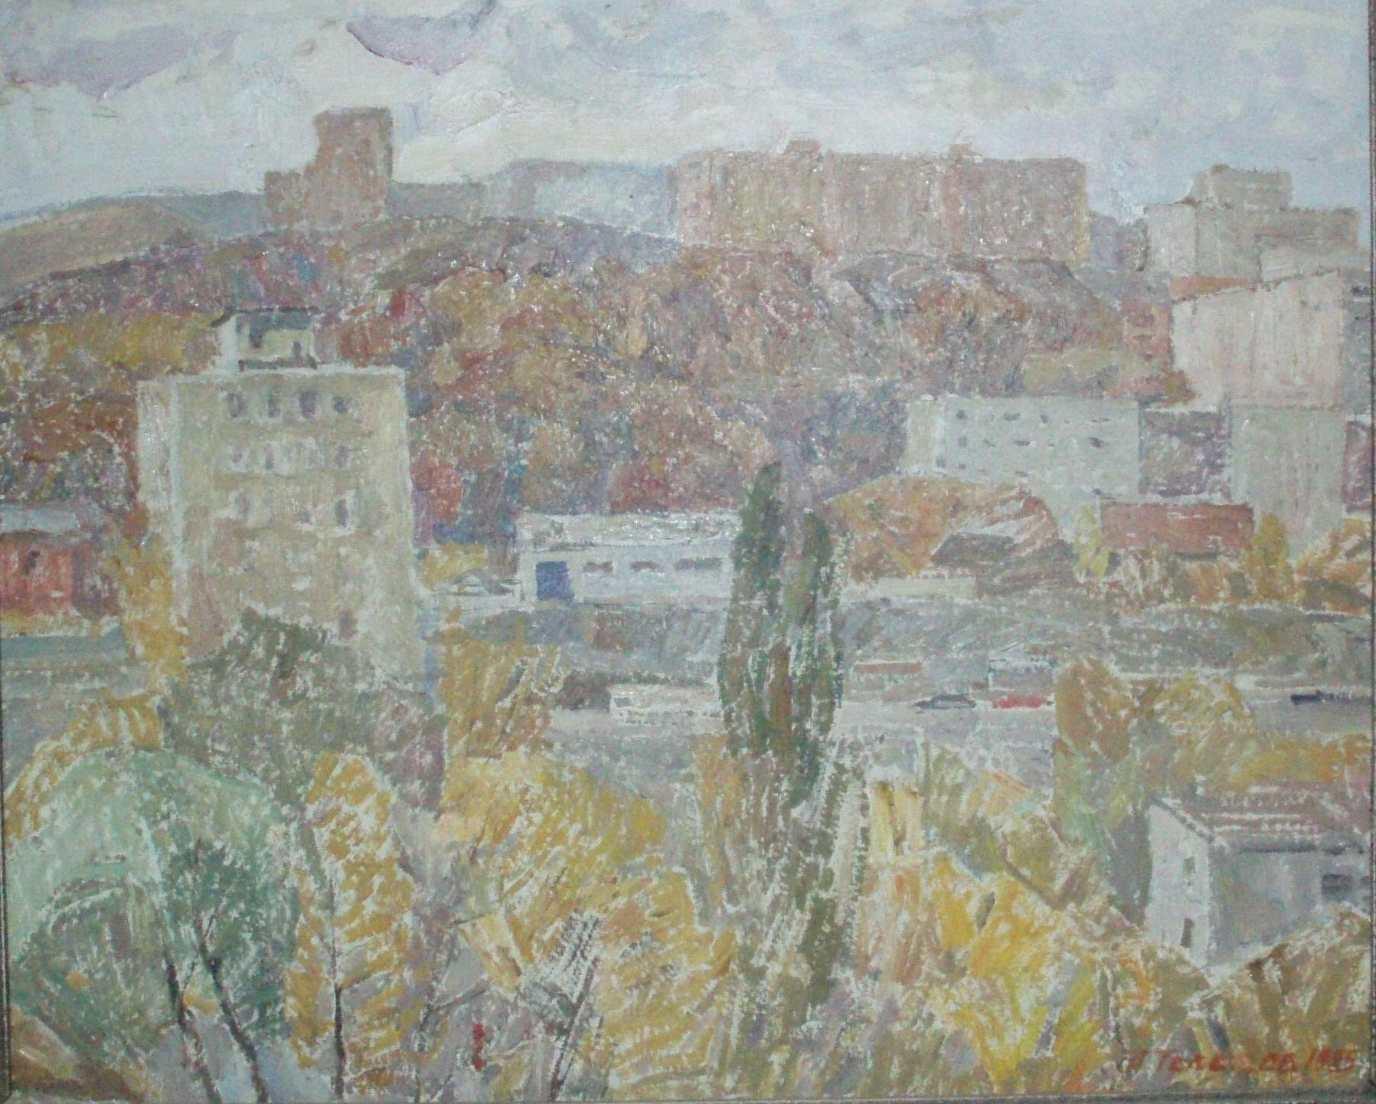 Телешов А. В. Из окна мастерской. 1985. Холст, масло. 48х60